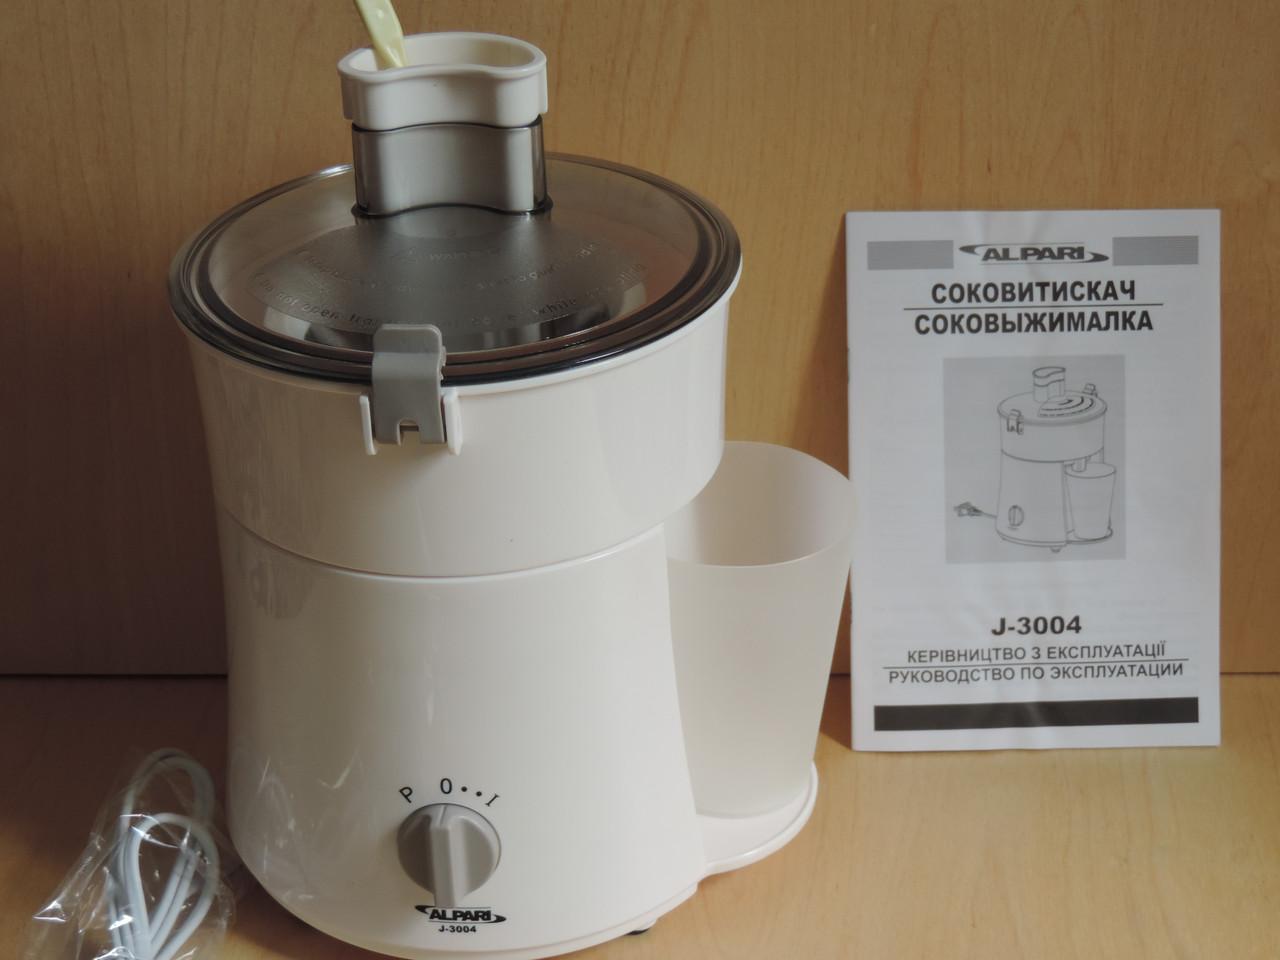 Соковыжималка Alpari J-3004.Мини соковыжималка.